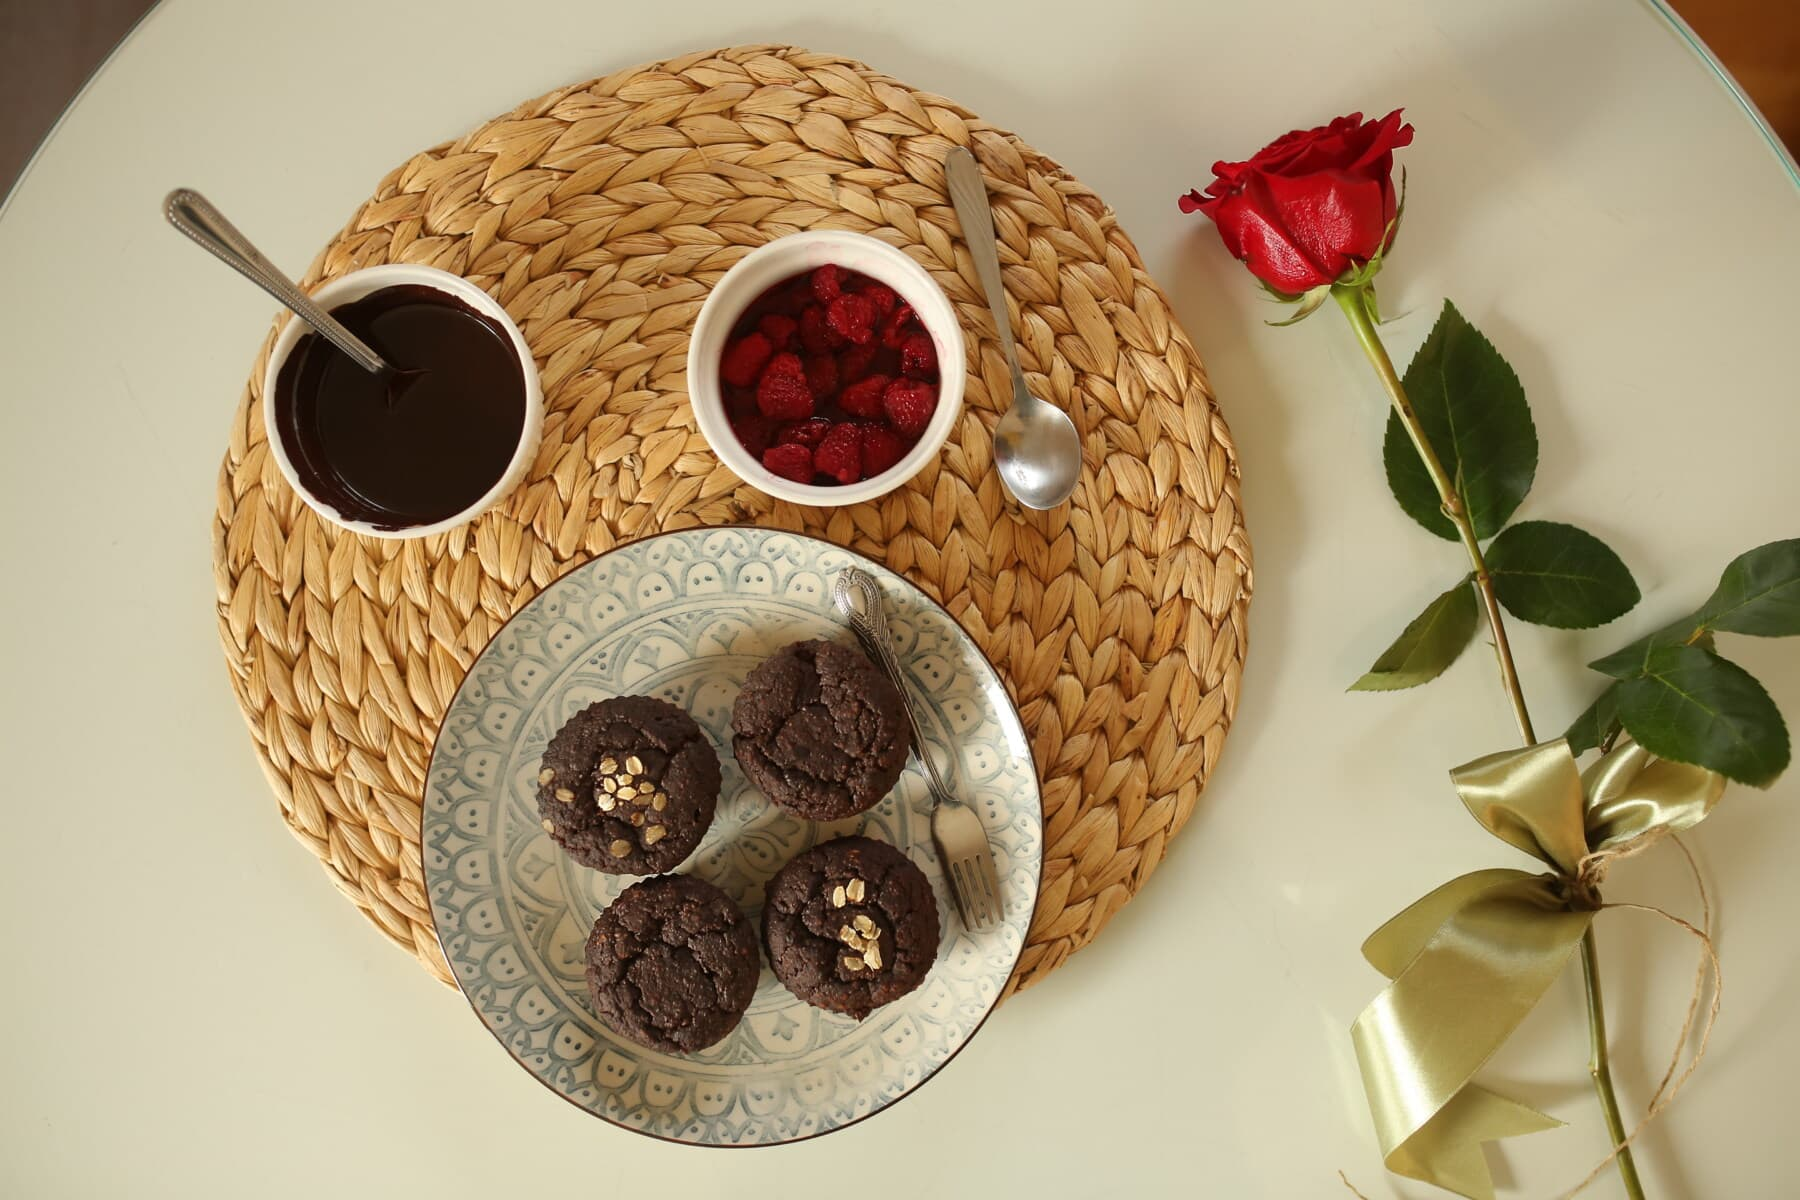 red, rose, breakfast, cupcake, fresh, chocolate, berries, still life, food, wood